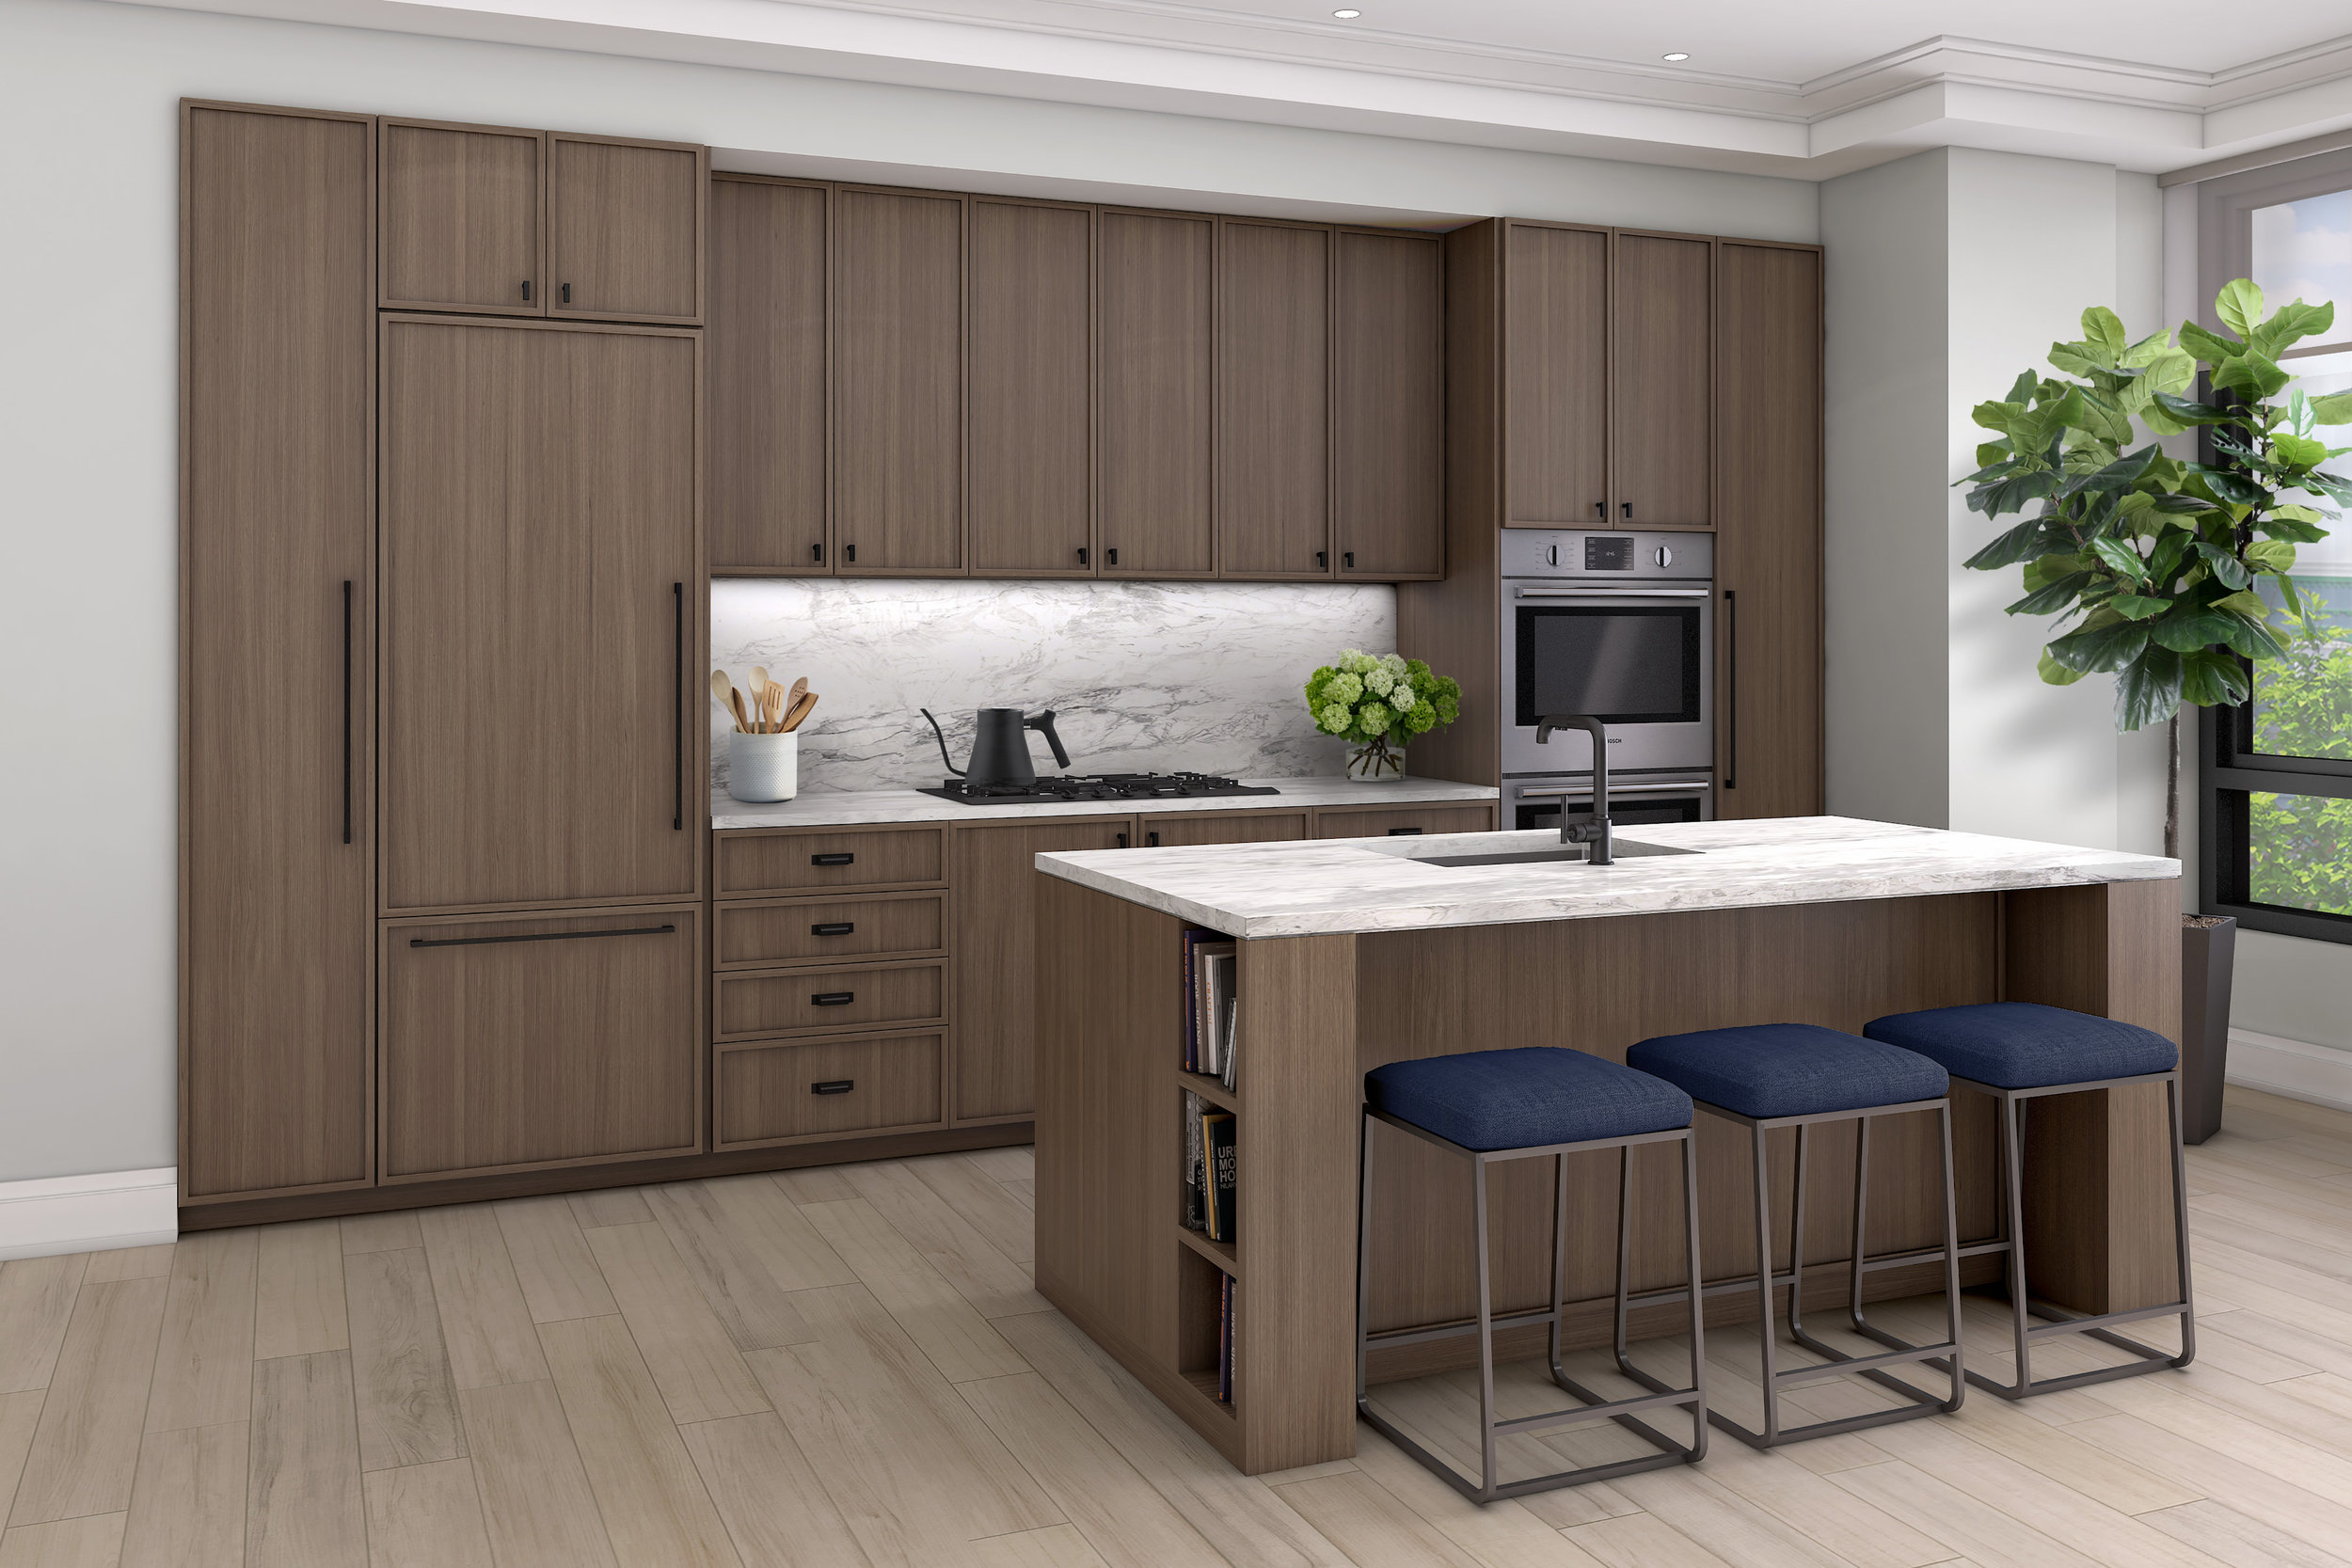 12 Unit 408 Kitchen 2018.jpg